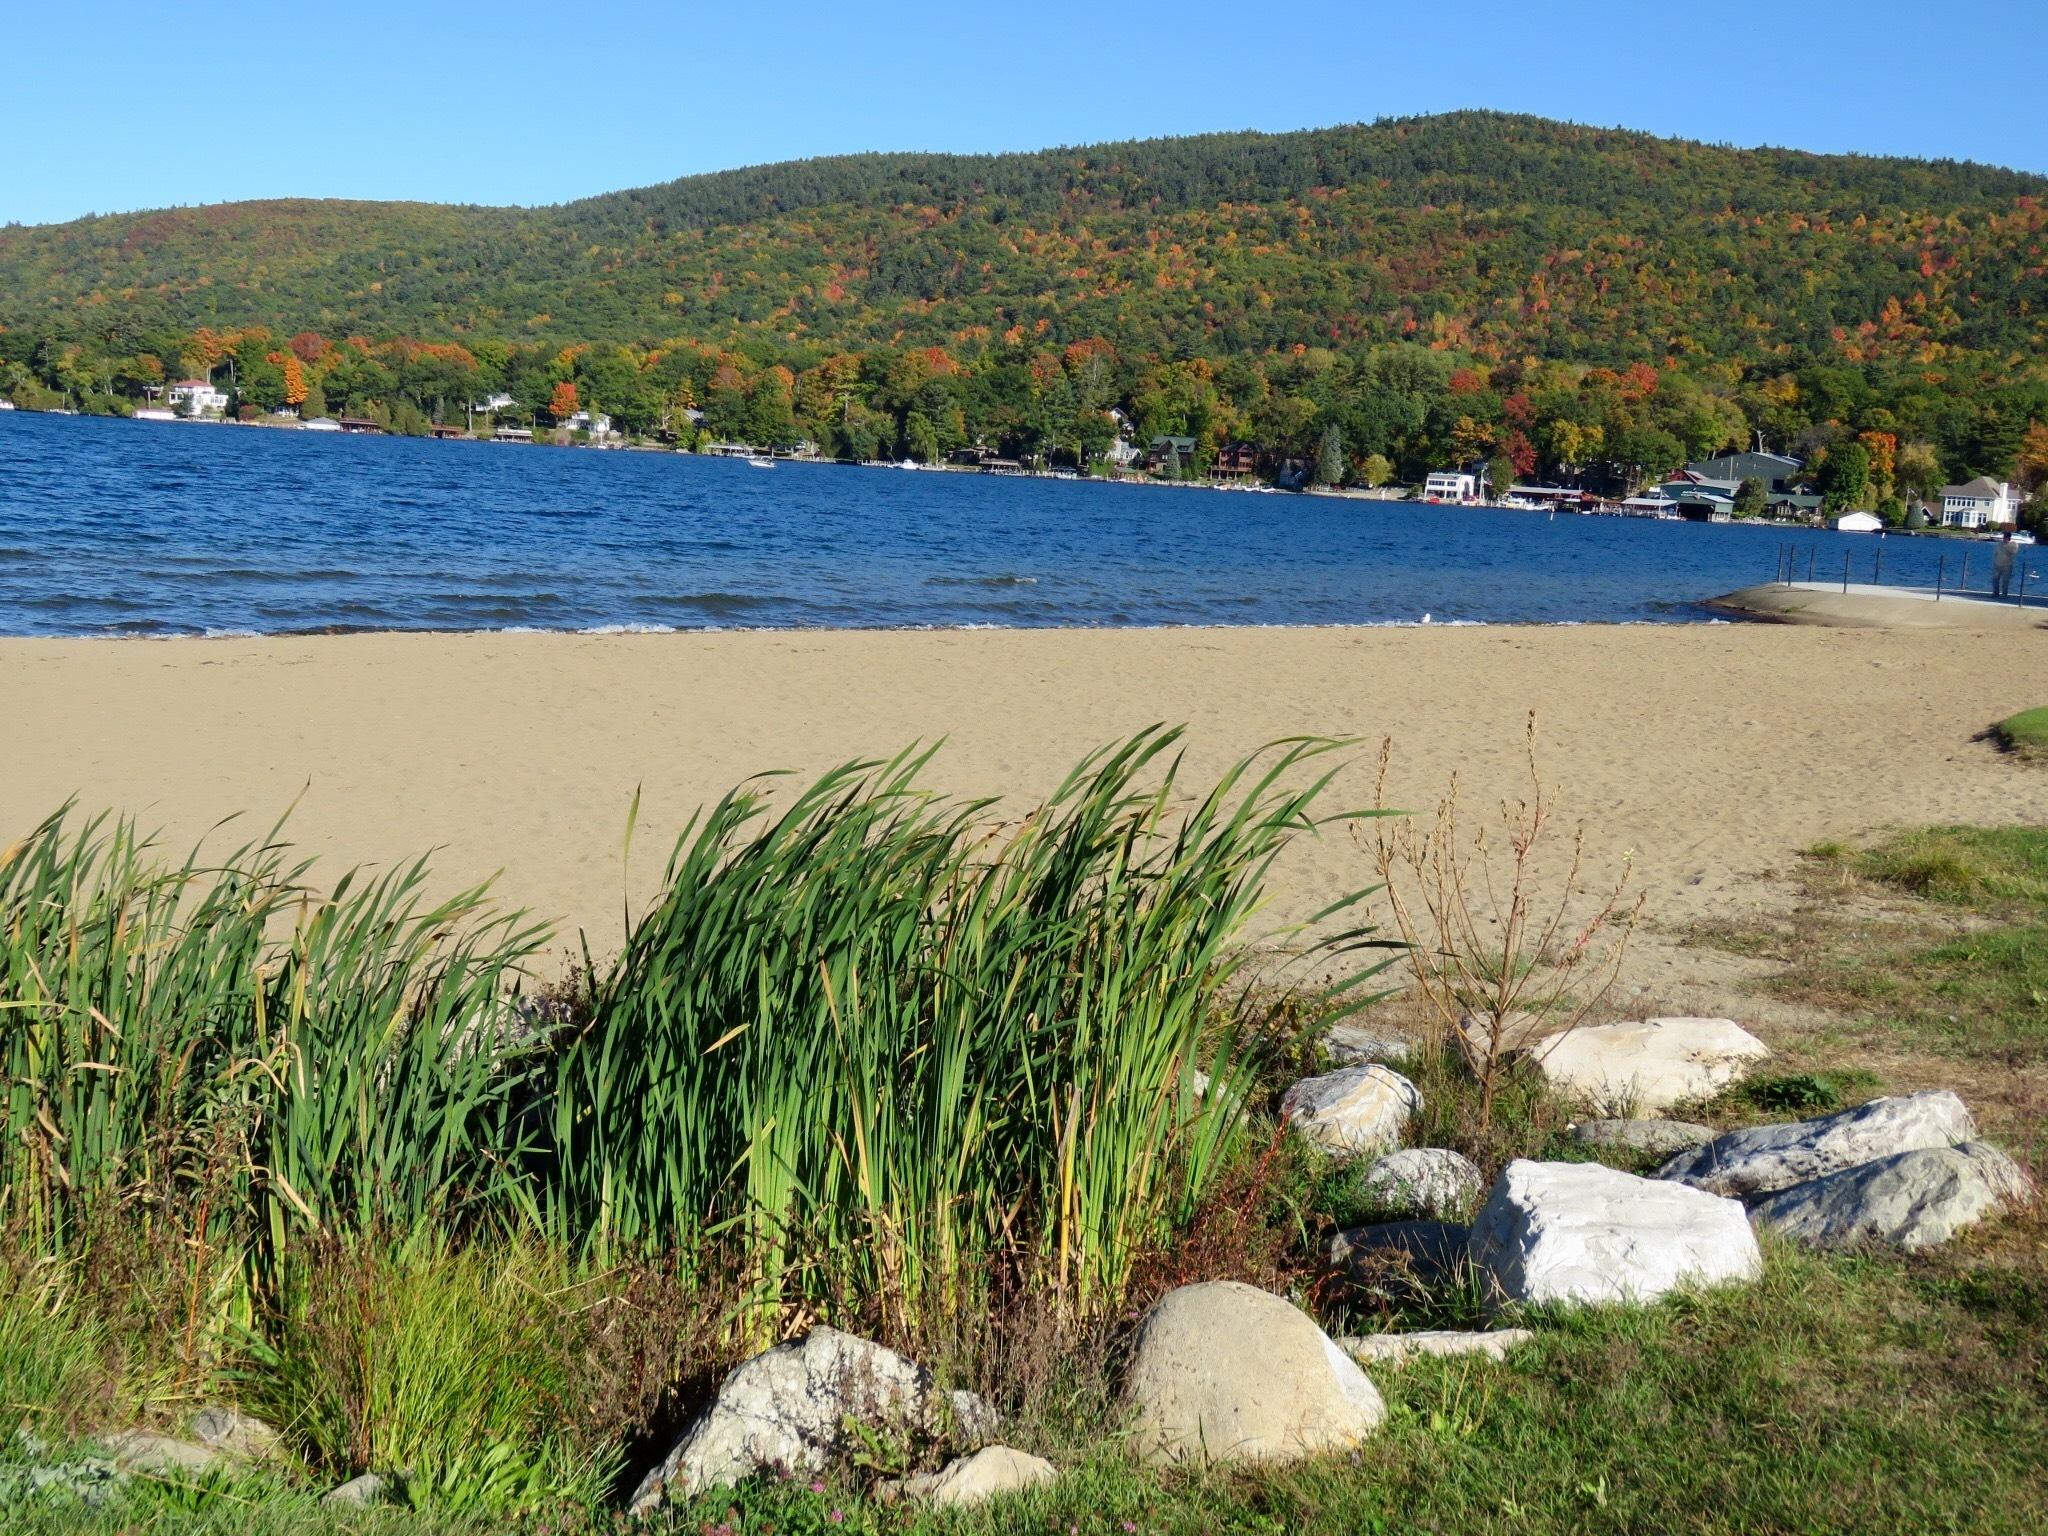 Lake George by Kimberly